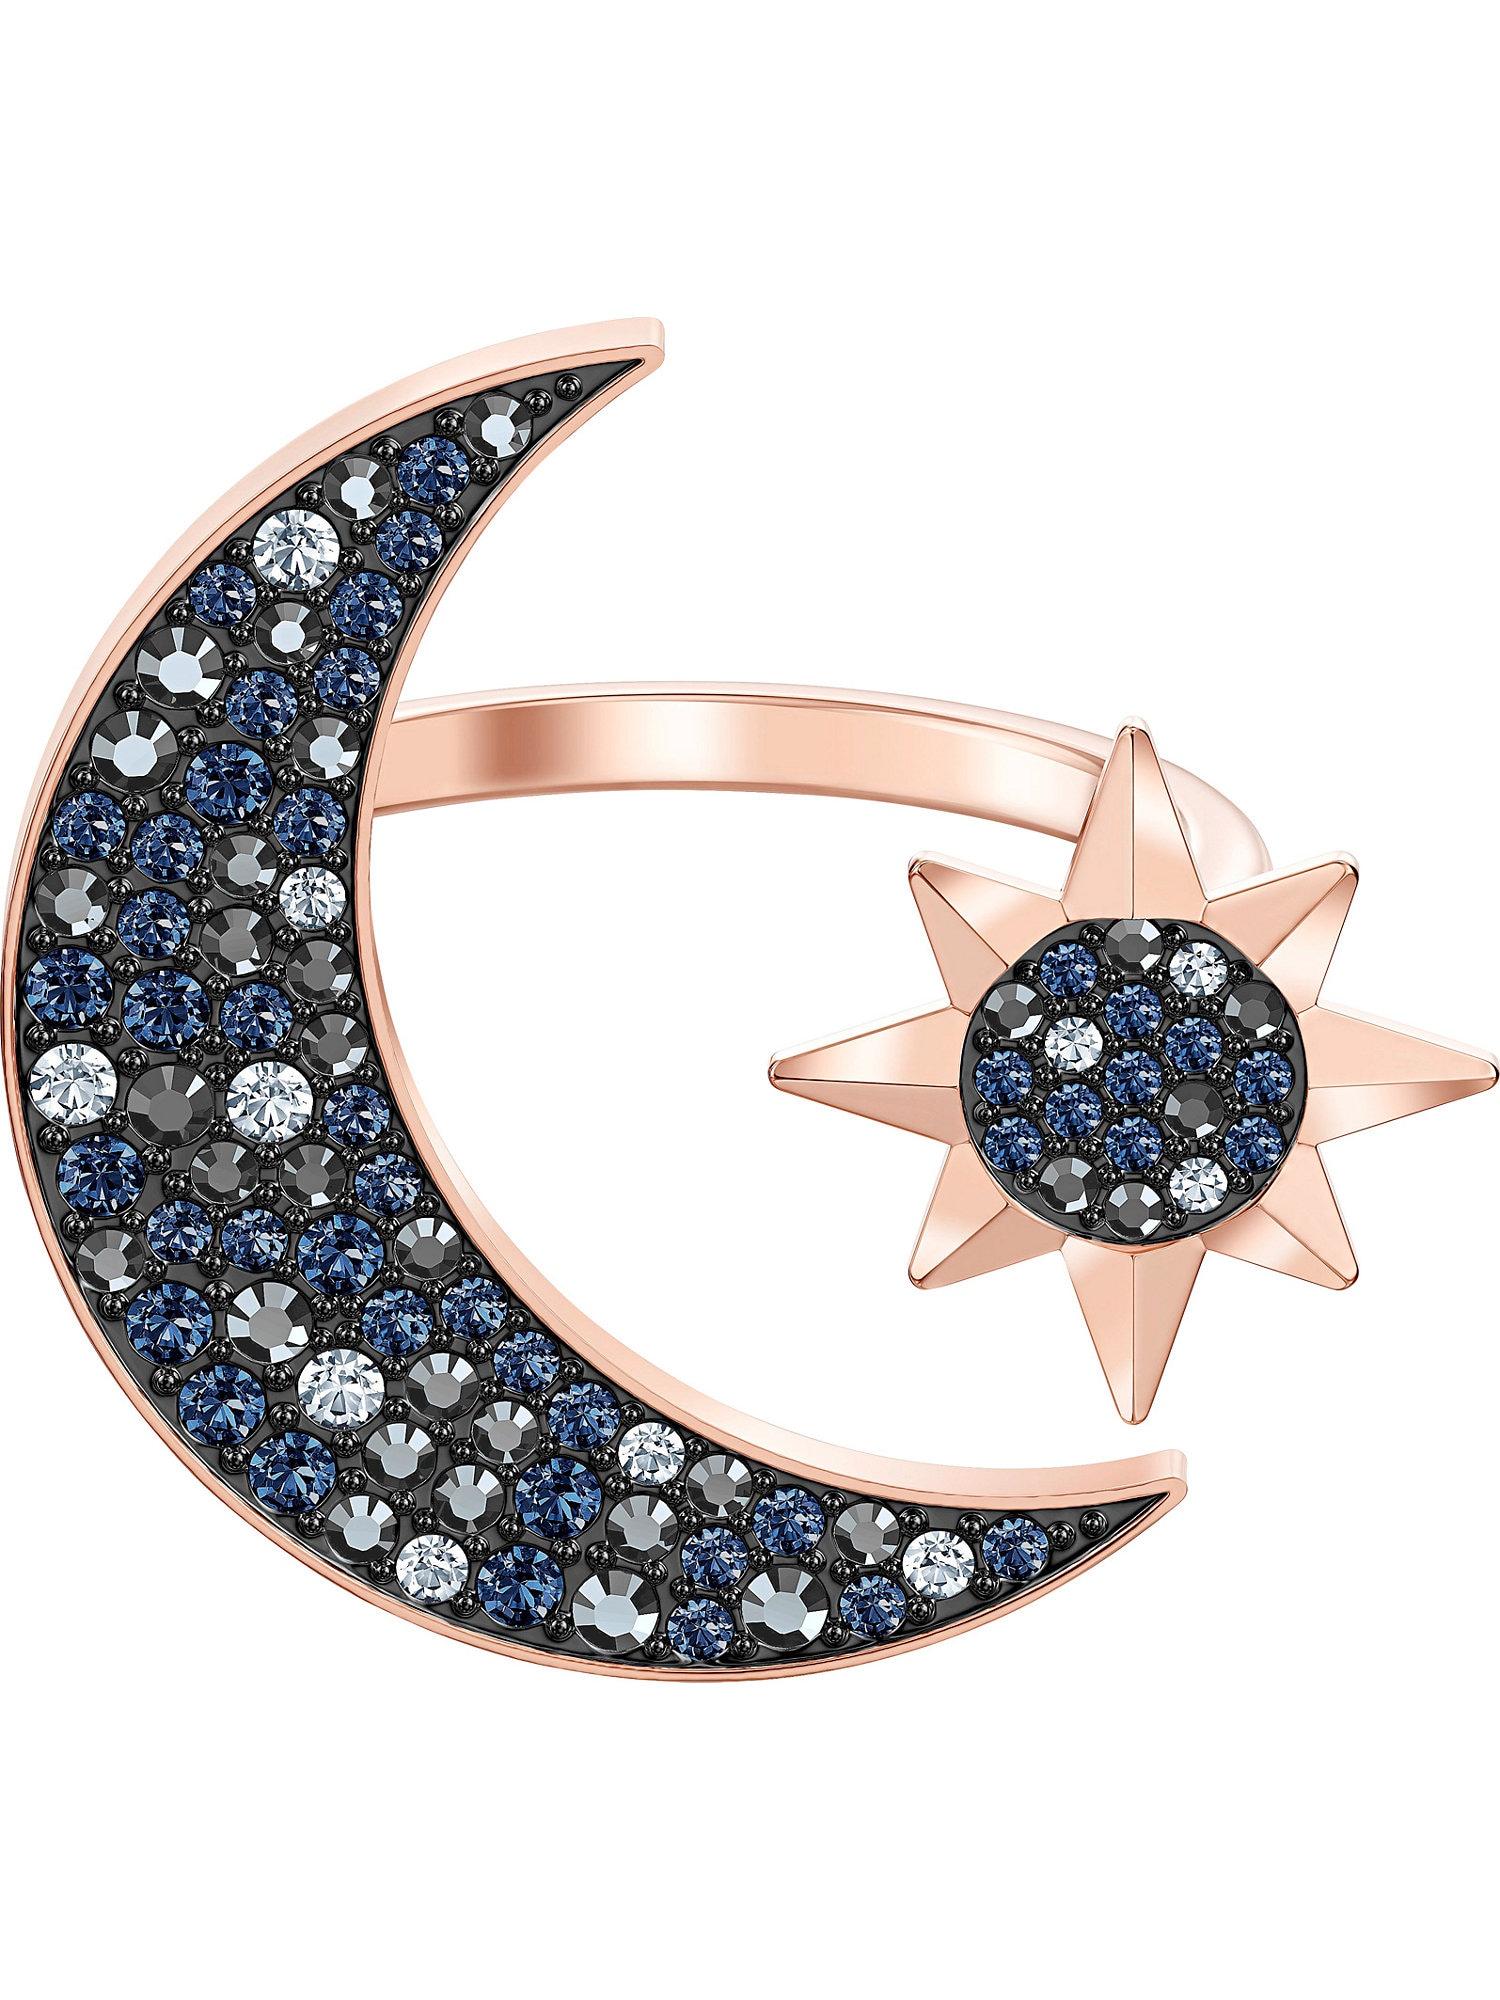 Damen Swarovski Ring 'Symbol' blau,  gold, blau,  gold,  schwarz, rot | 09009654996135